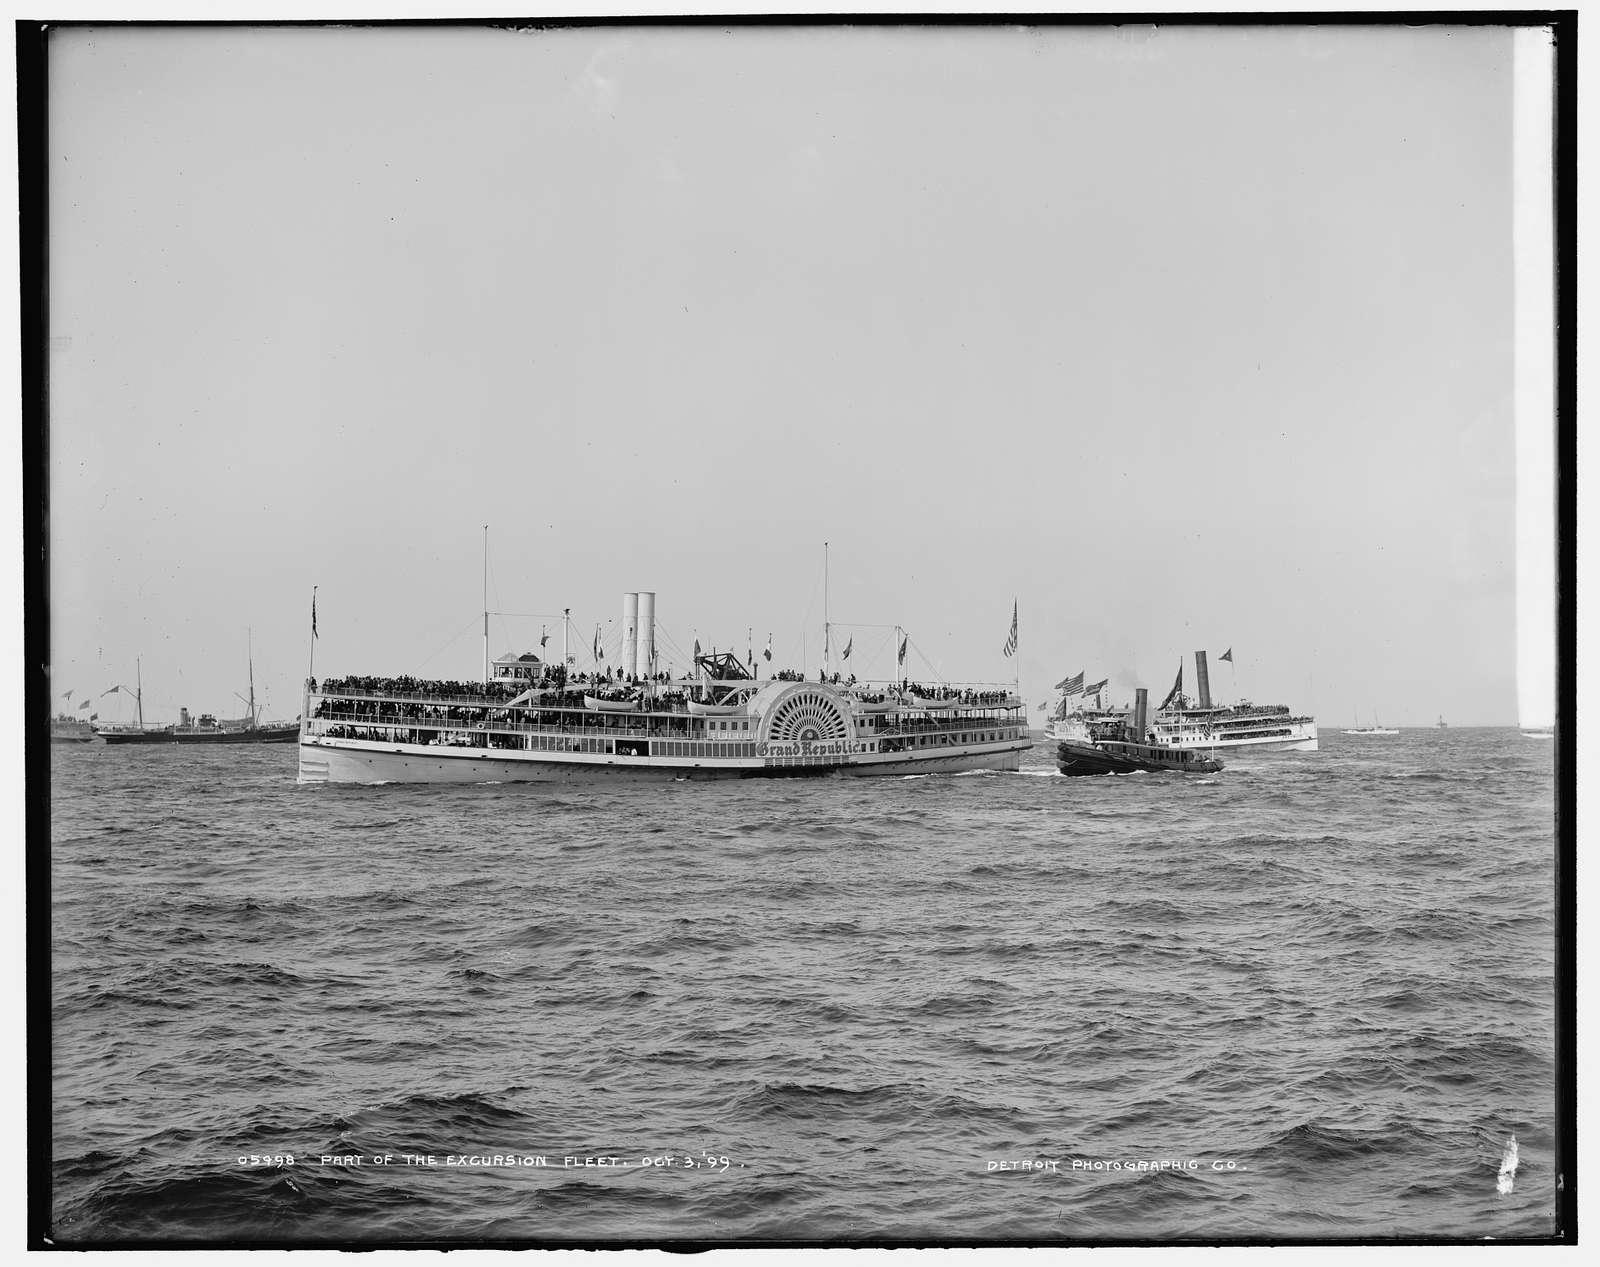 Part of the excursion fleet